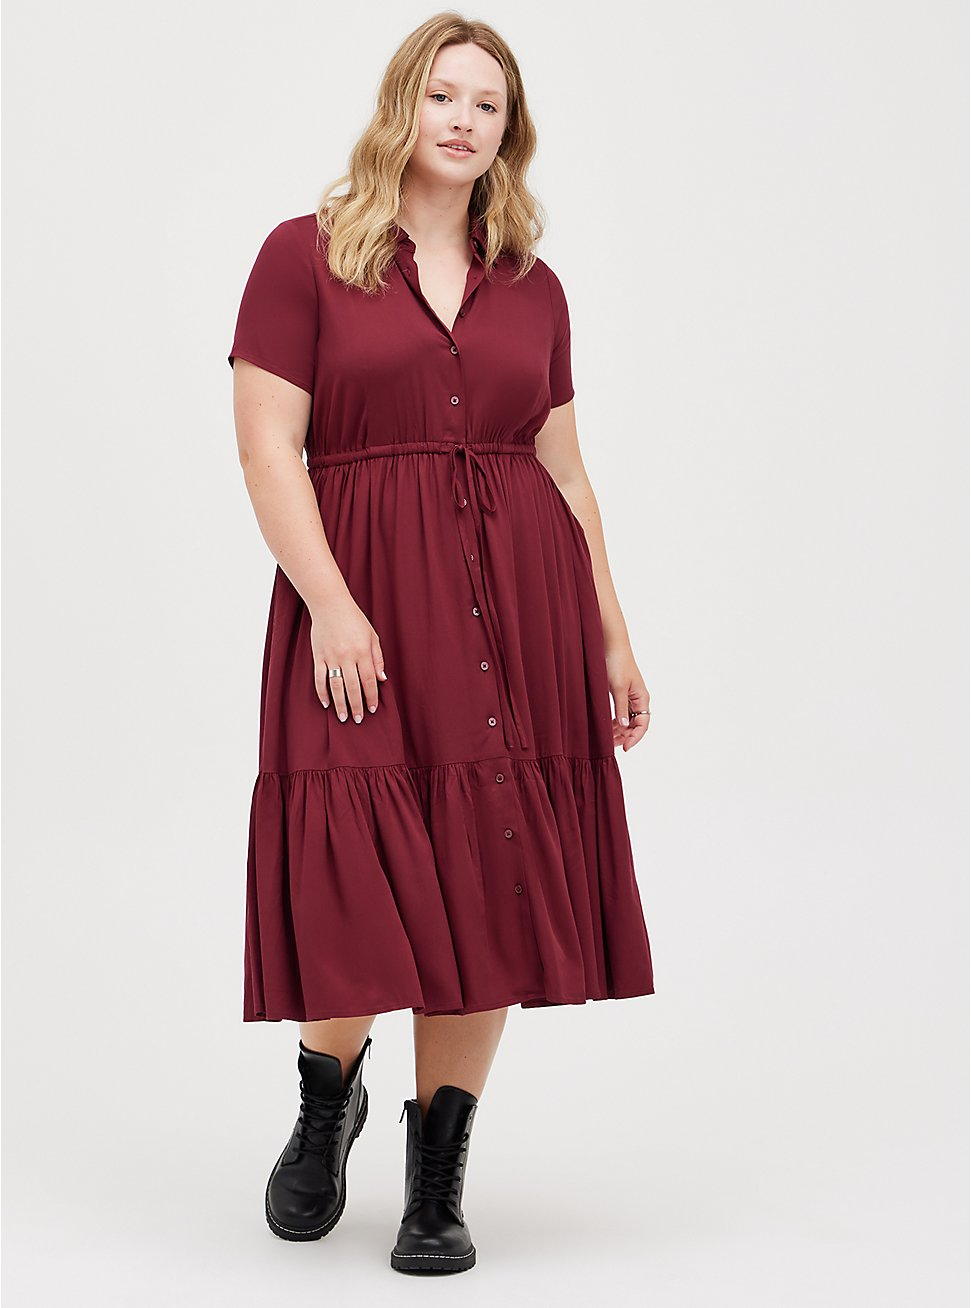 Tiered Midi Shirt Dress - Stretch Challis Burgundy, ZINFANDEL, hi-res